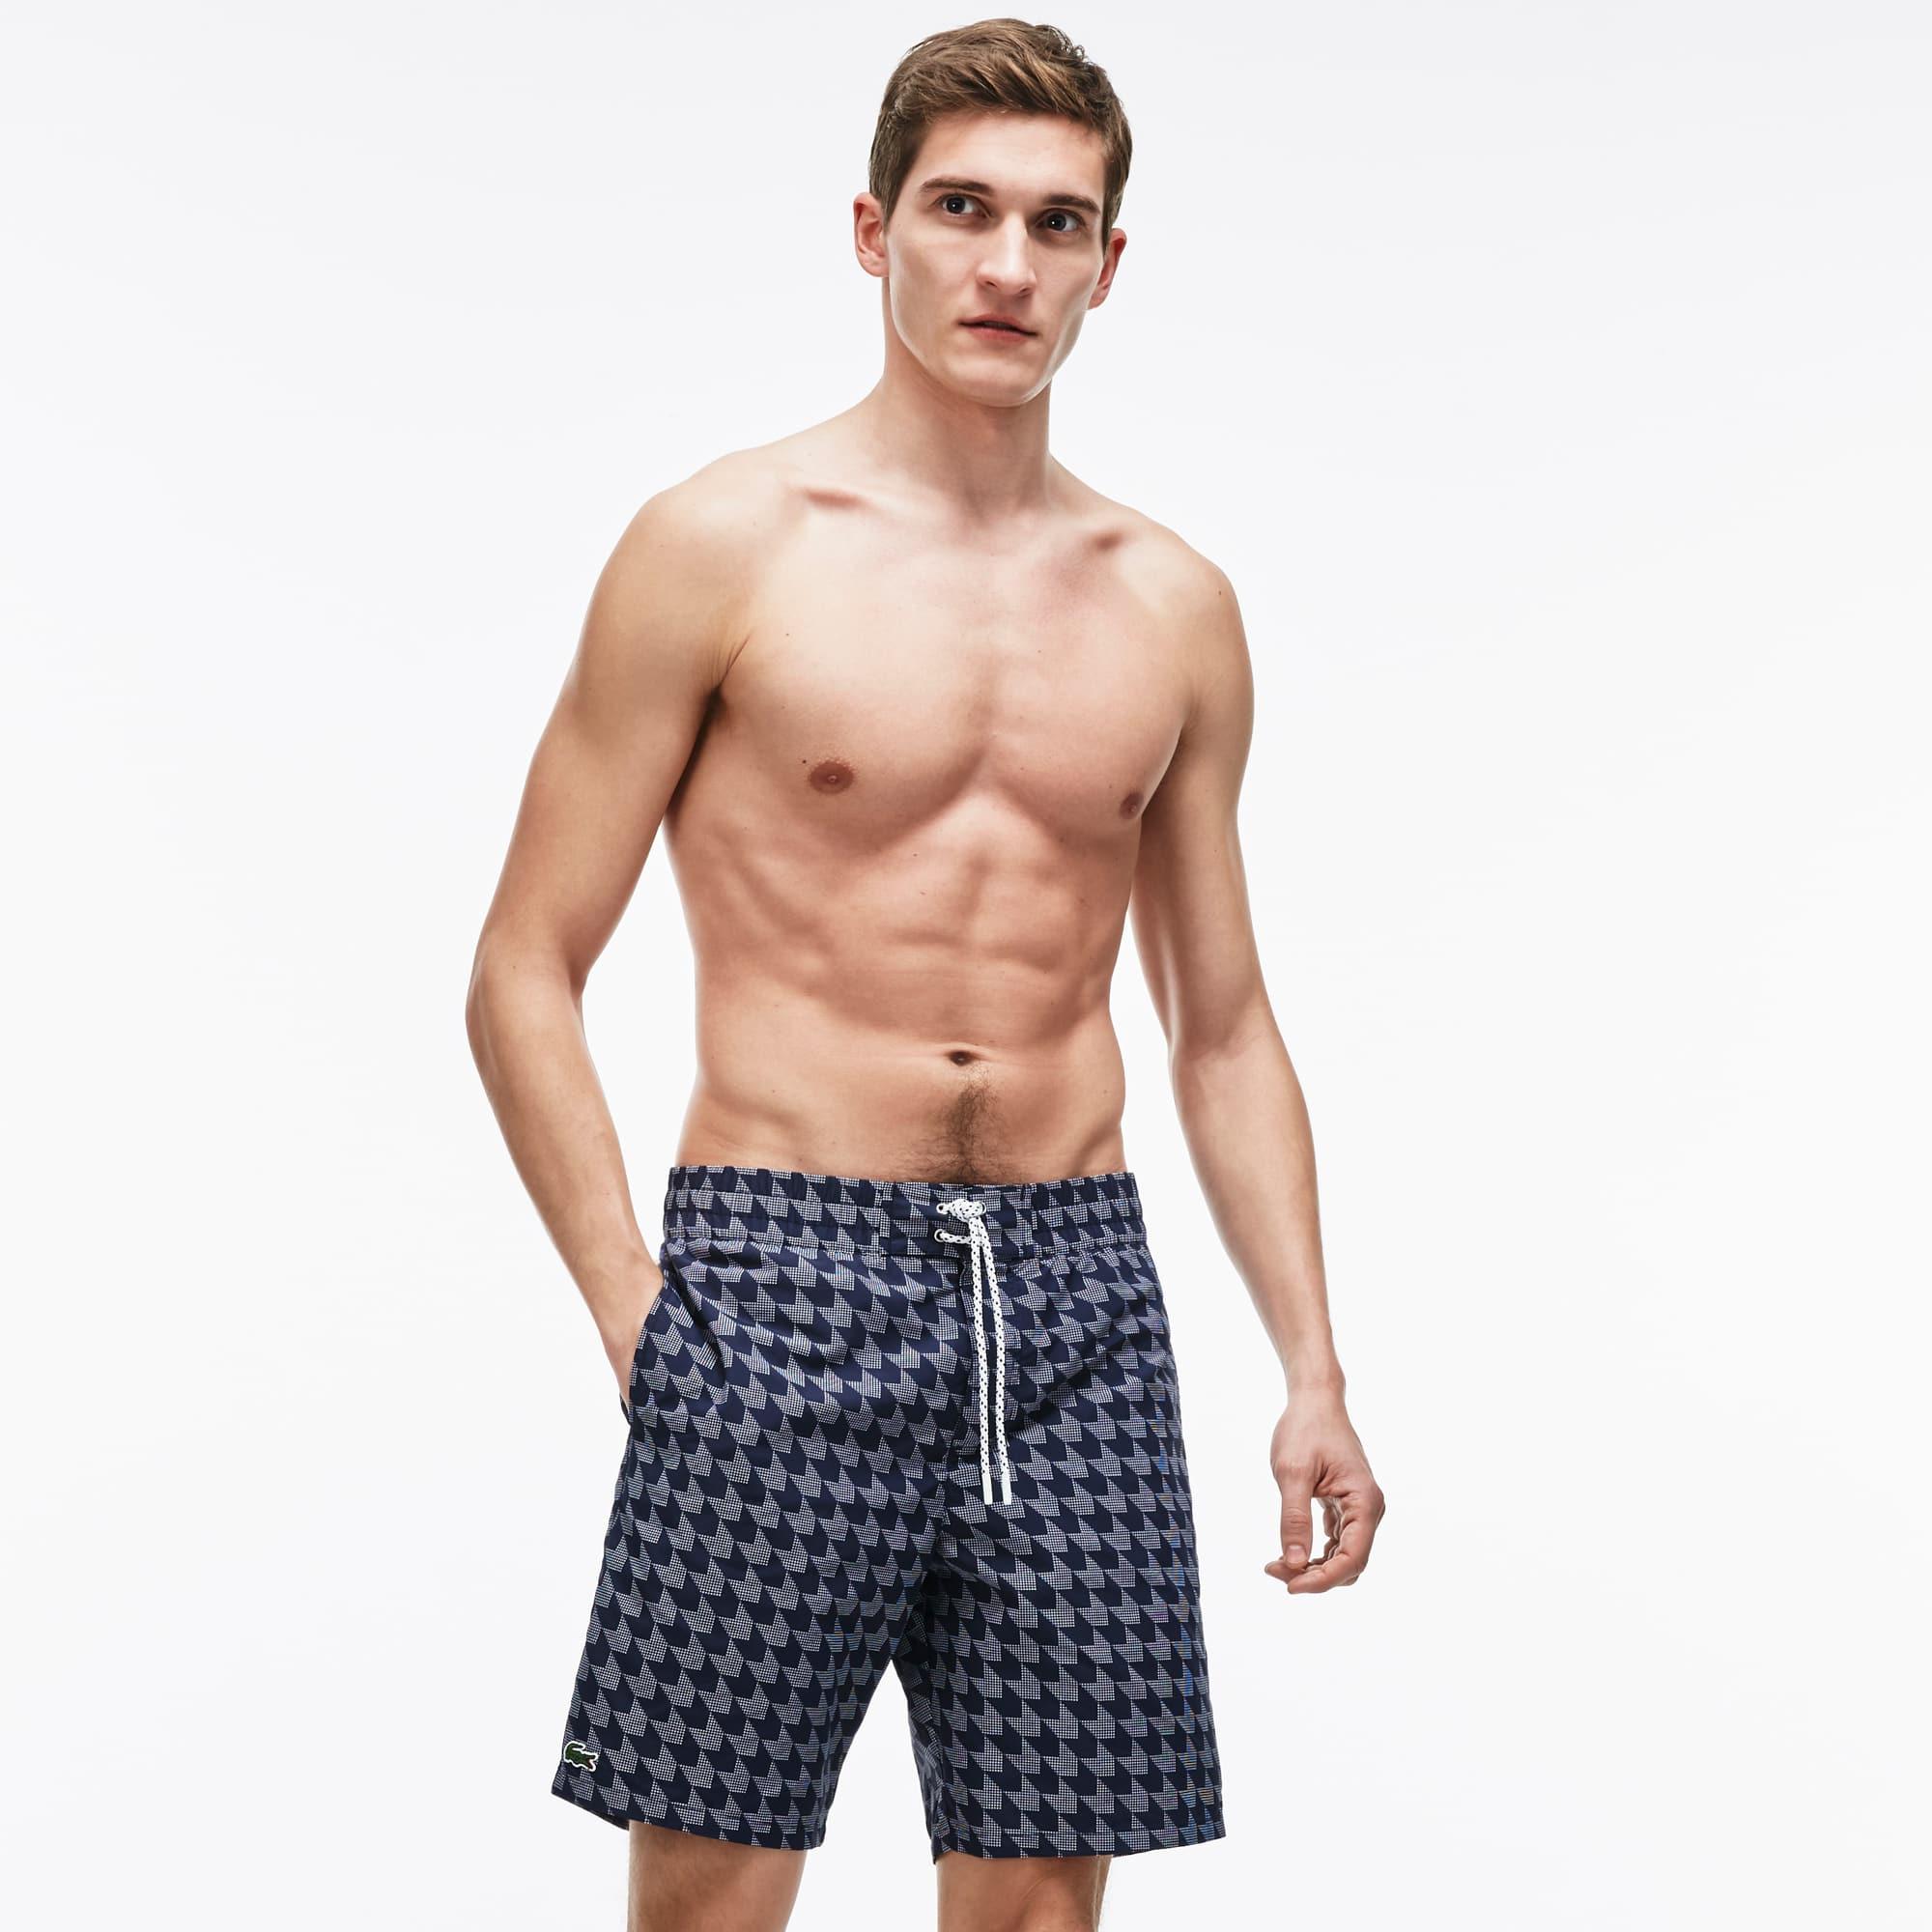 Men's Long Cut Houndstooth Print Swimming Trunks